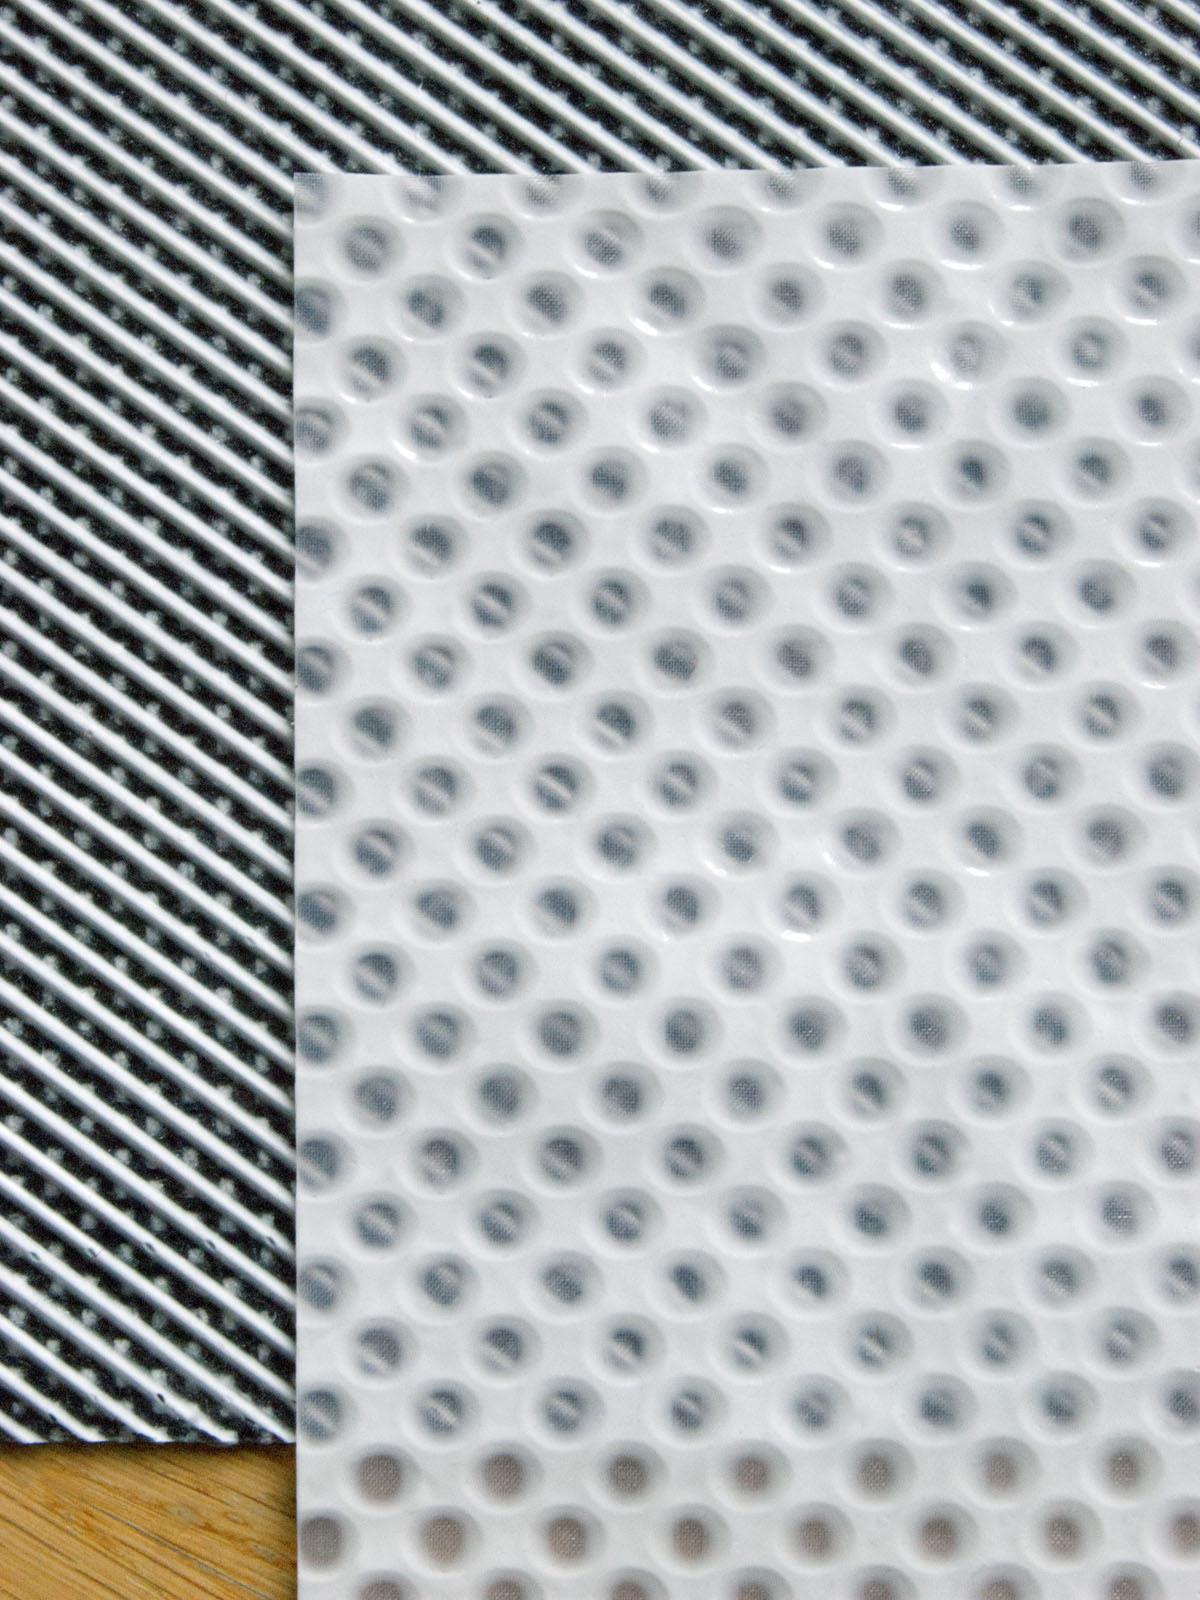 Black & white coatings